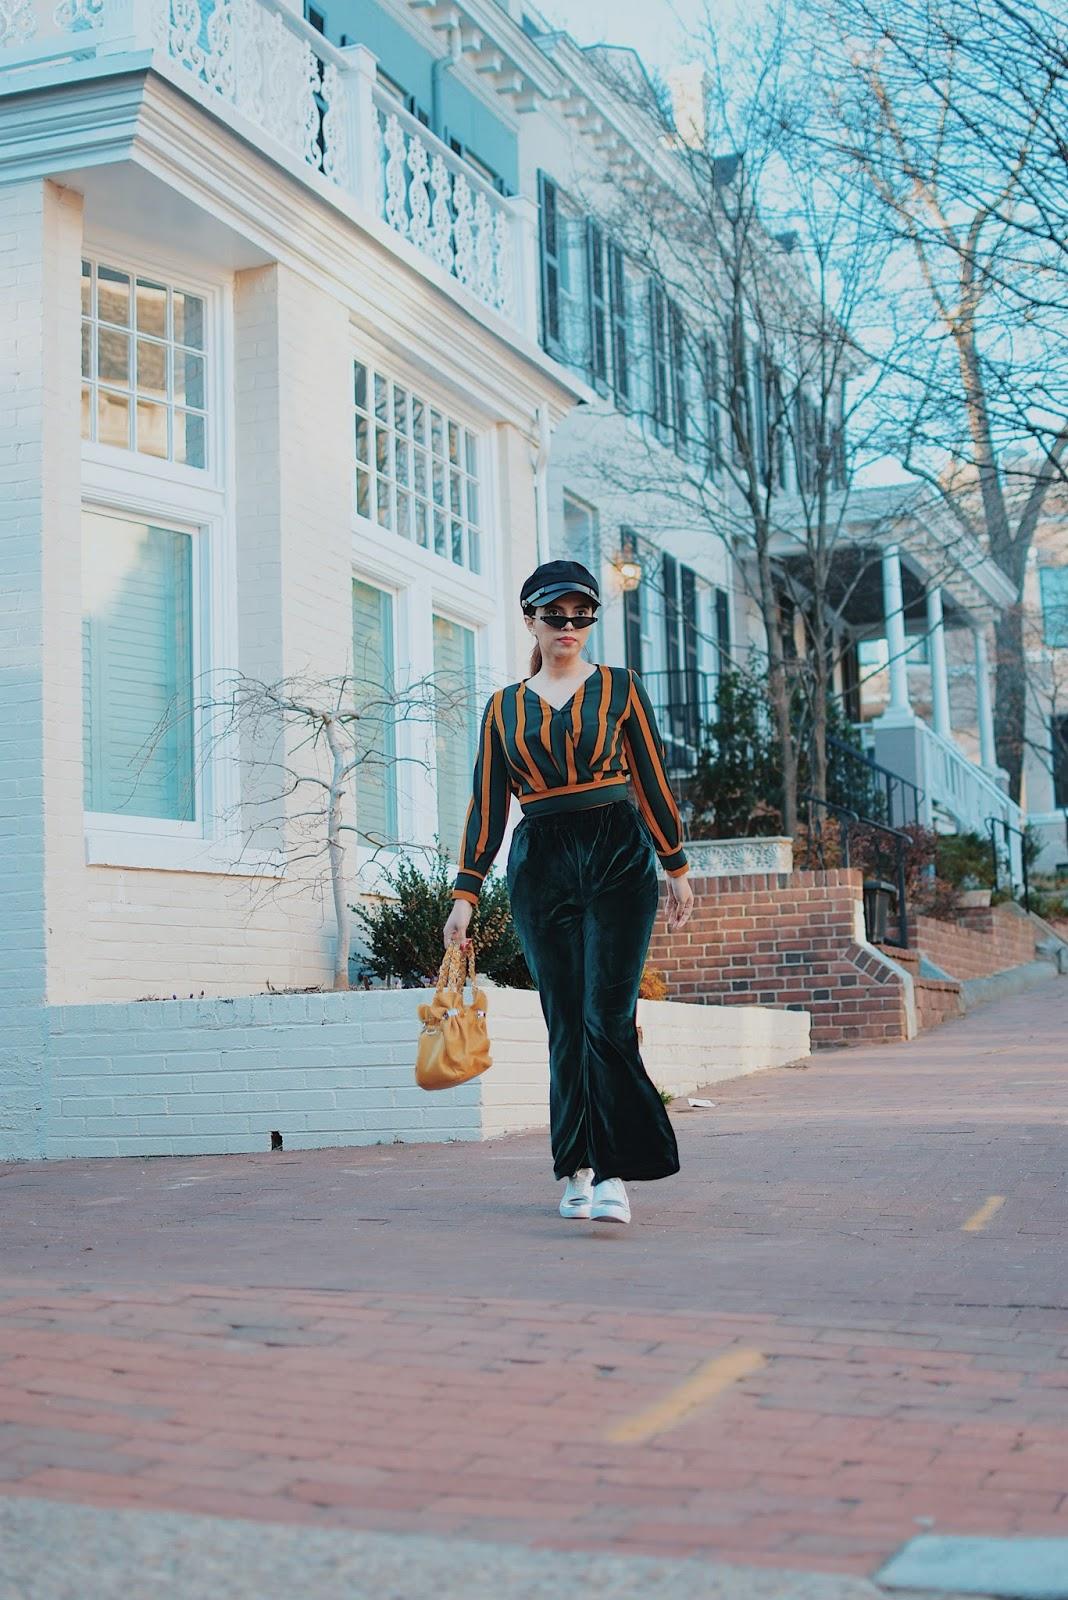 Stripes -Velvet- Mari Estilo-fashionblogger-lookoftheday-dcblogger-armandhugon-streetstyle-fashionista-moda-sportychic-primavera2018